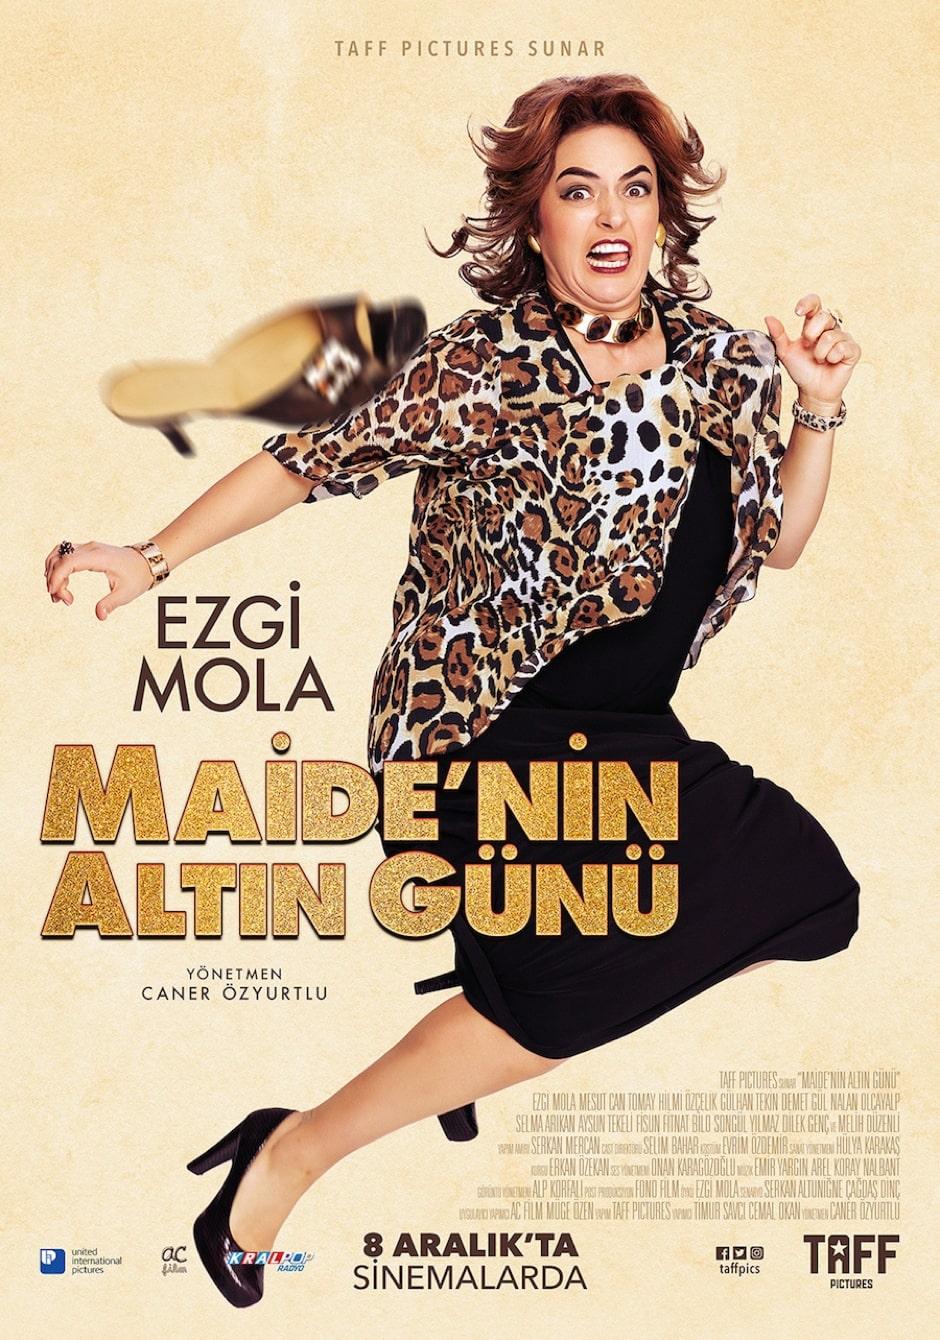 Maidenin_Altın_Gunu_Poster Copy 2-min